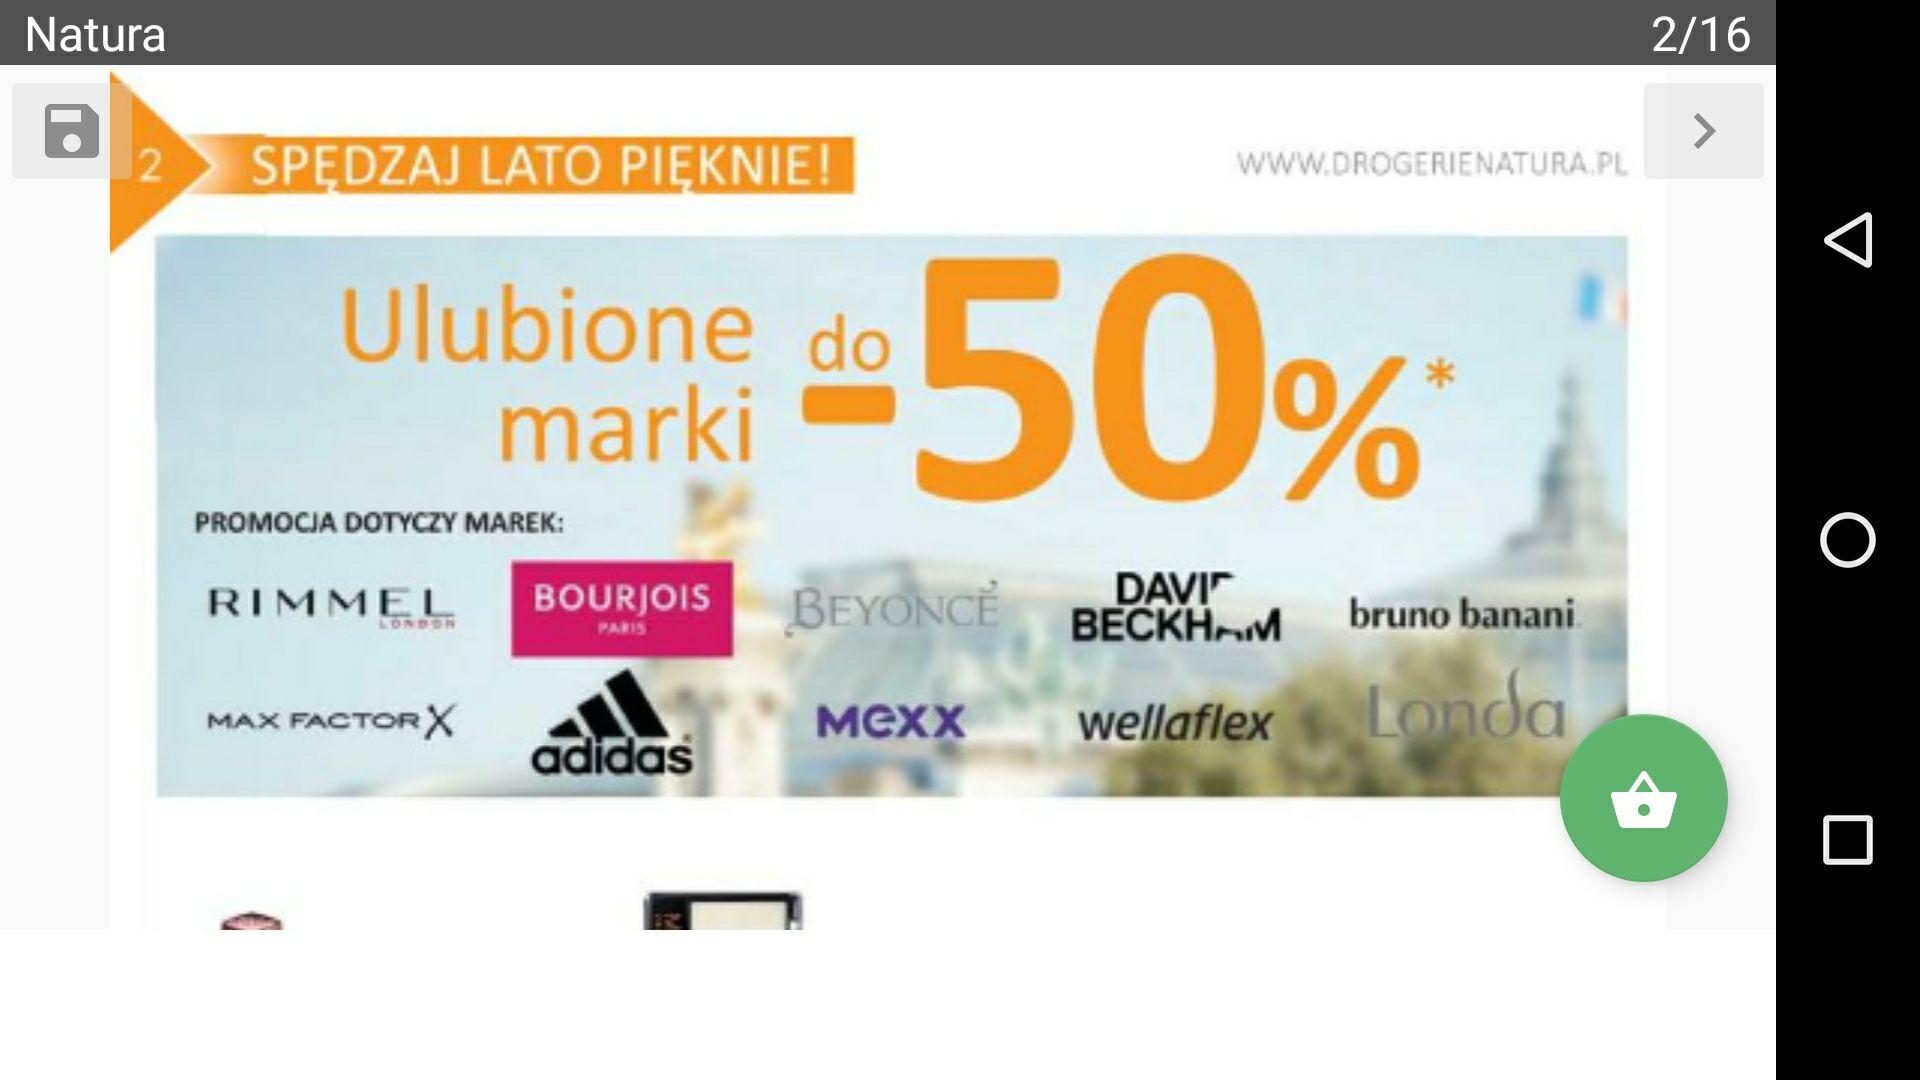 Drogeria natura do -50% na ulubione marki